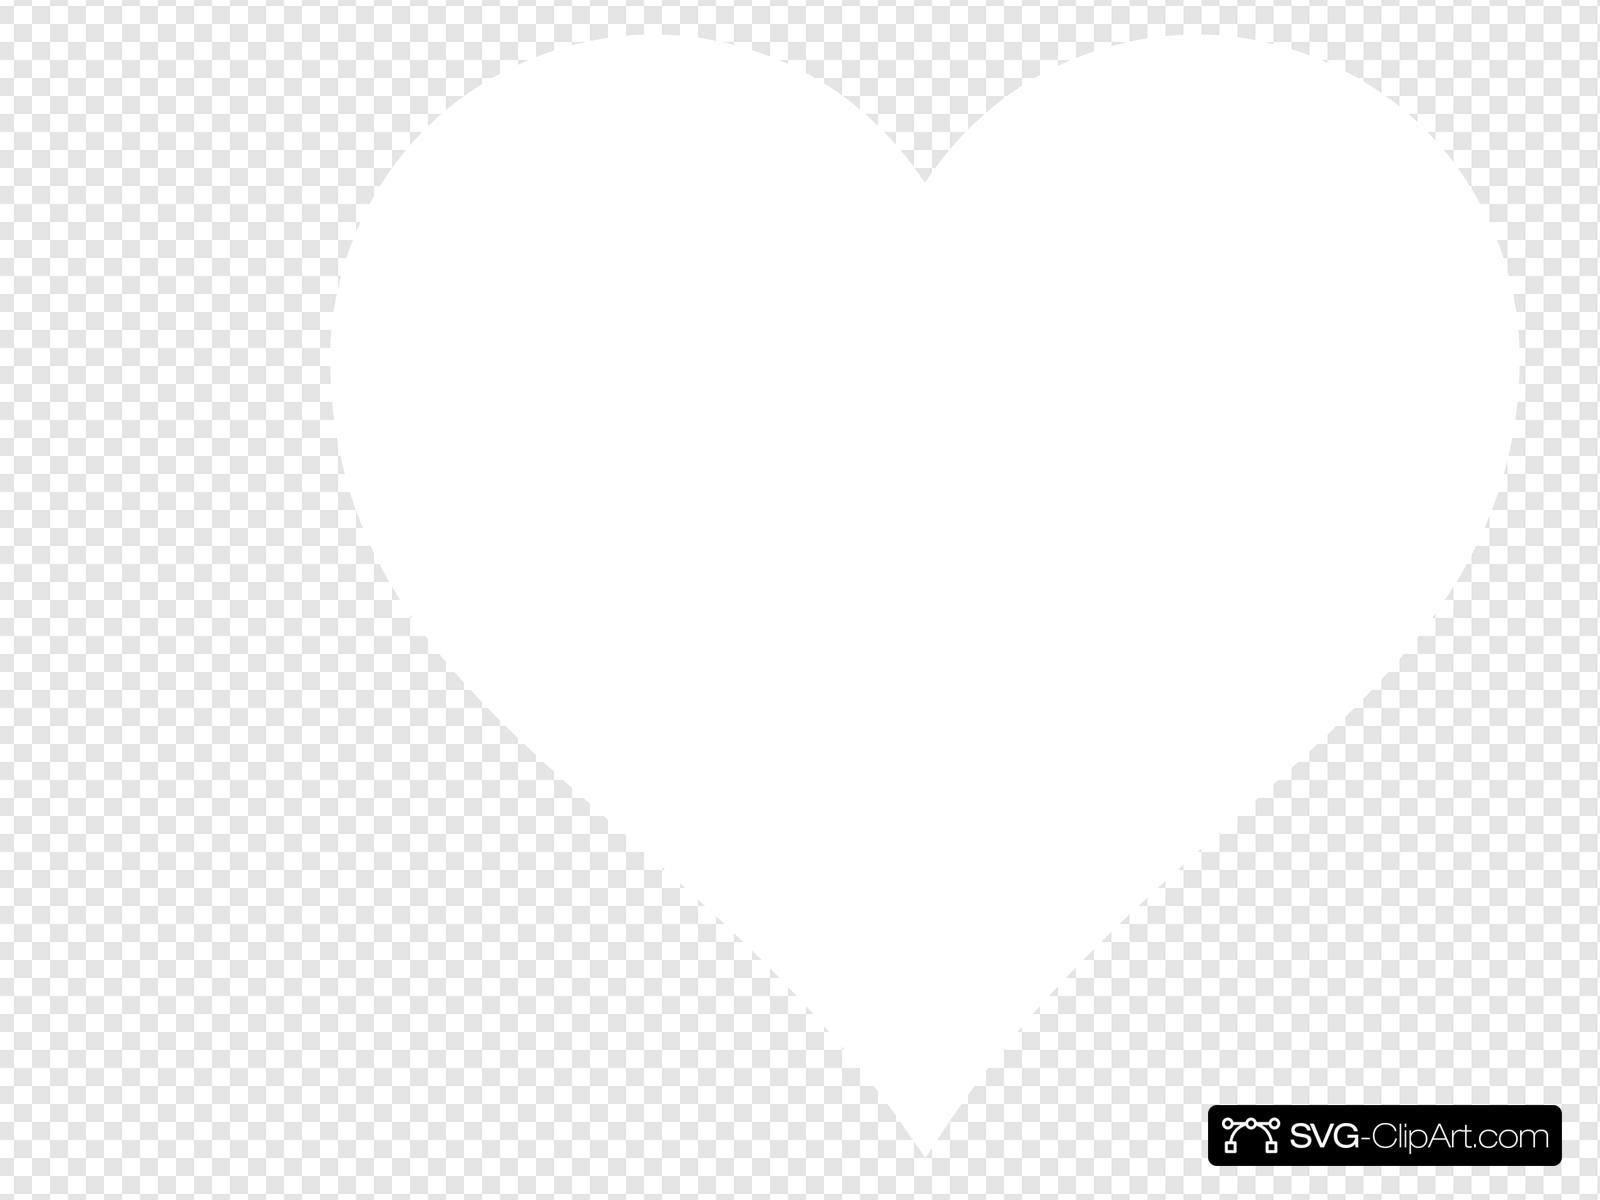 White Heart Clip art, Icon and SVG.